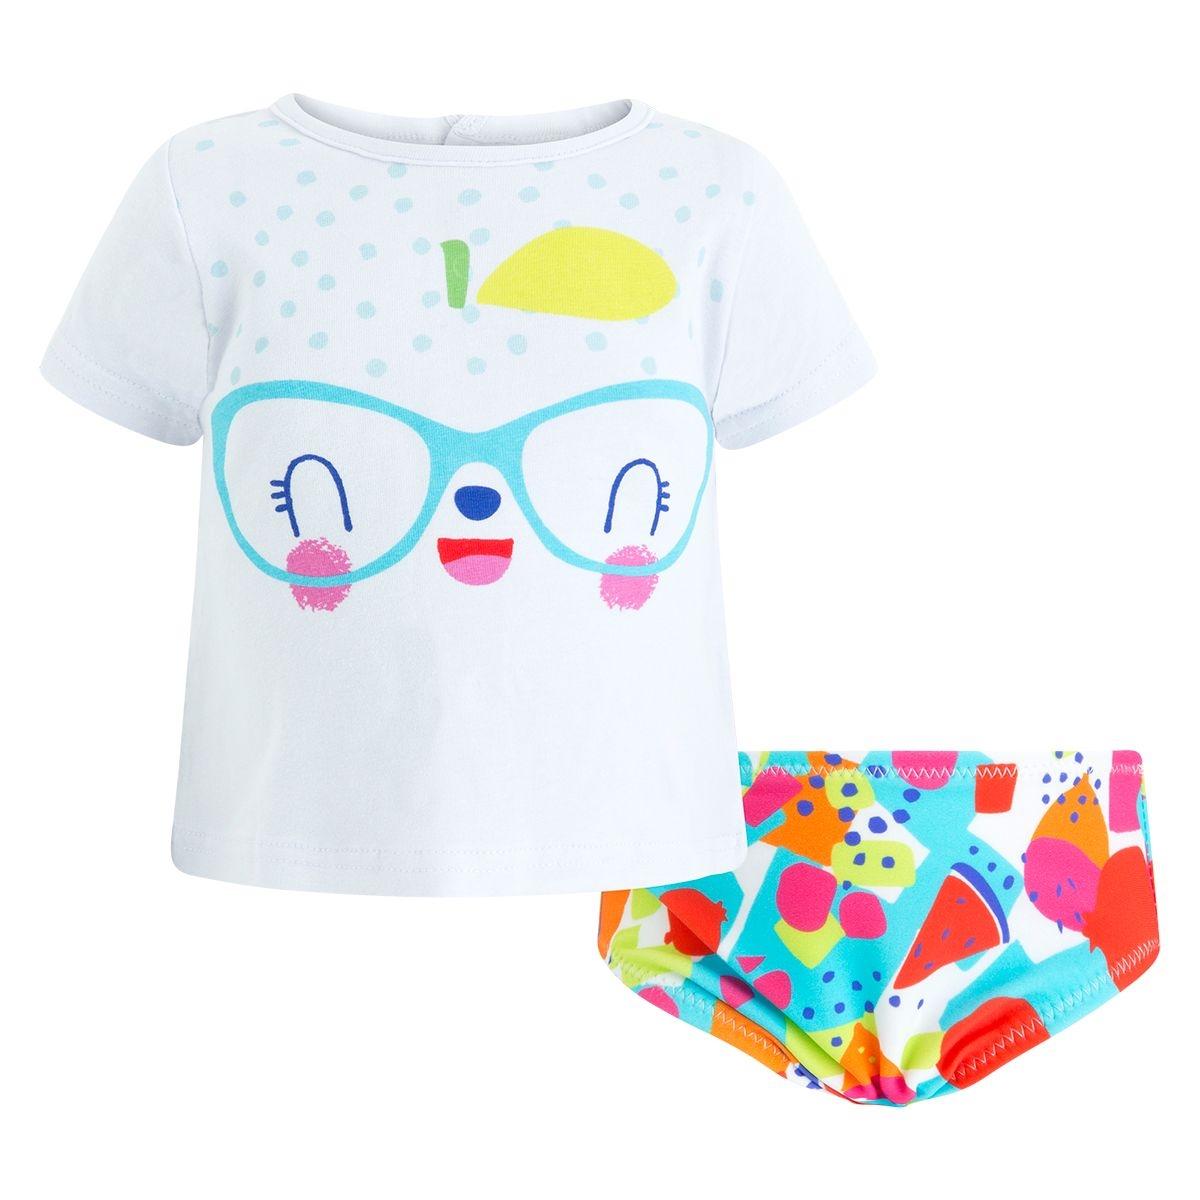 Culotte de bain lycra+tee-shirt jersey smoothies